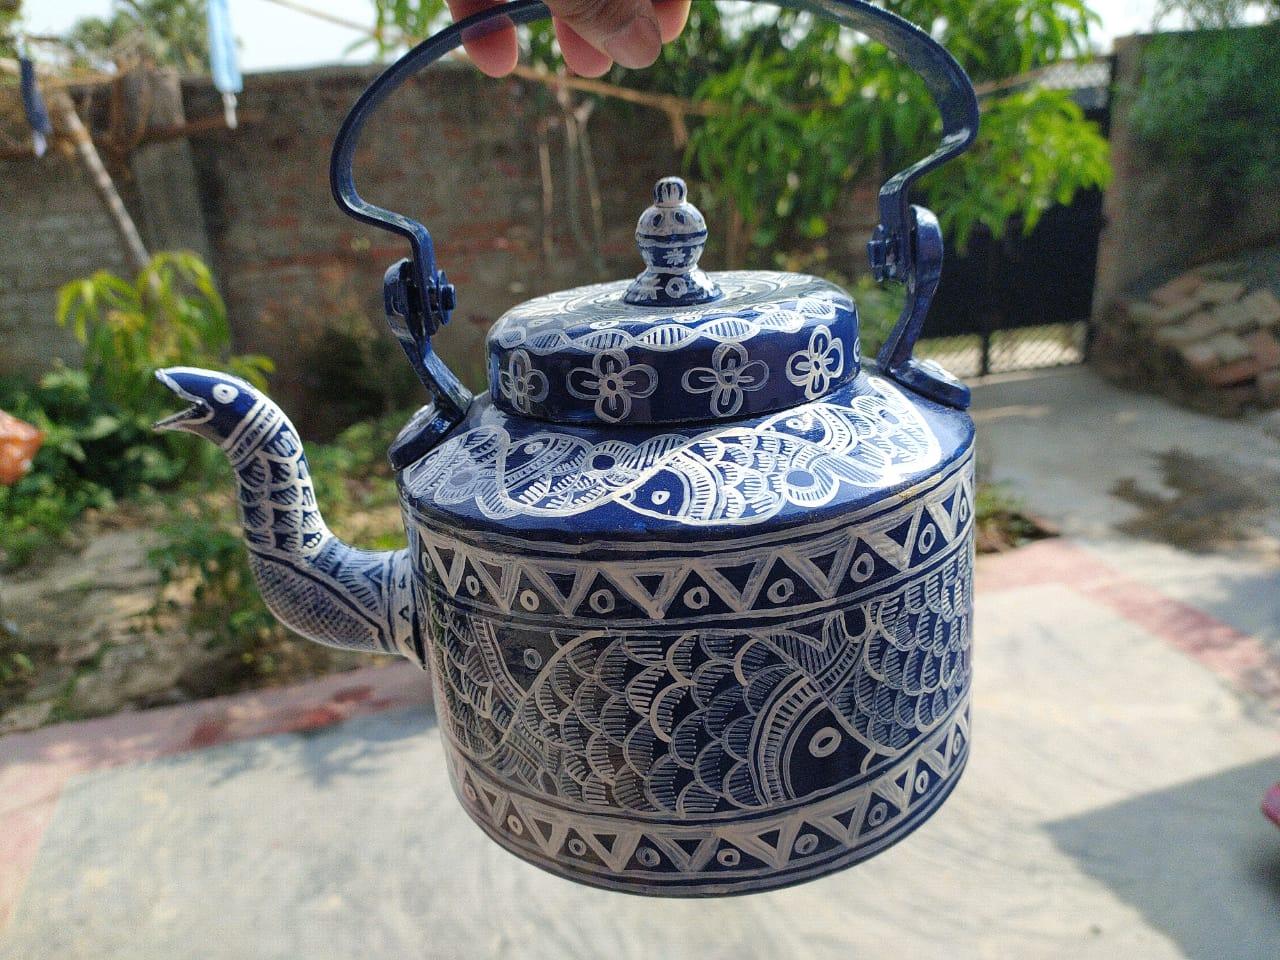 Decorative Teapot with Madhubani artwork